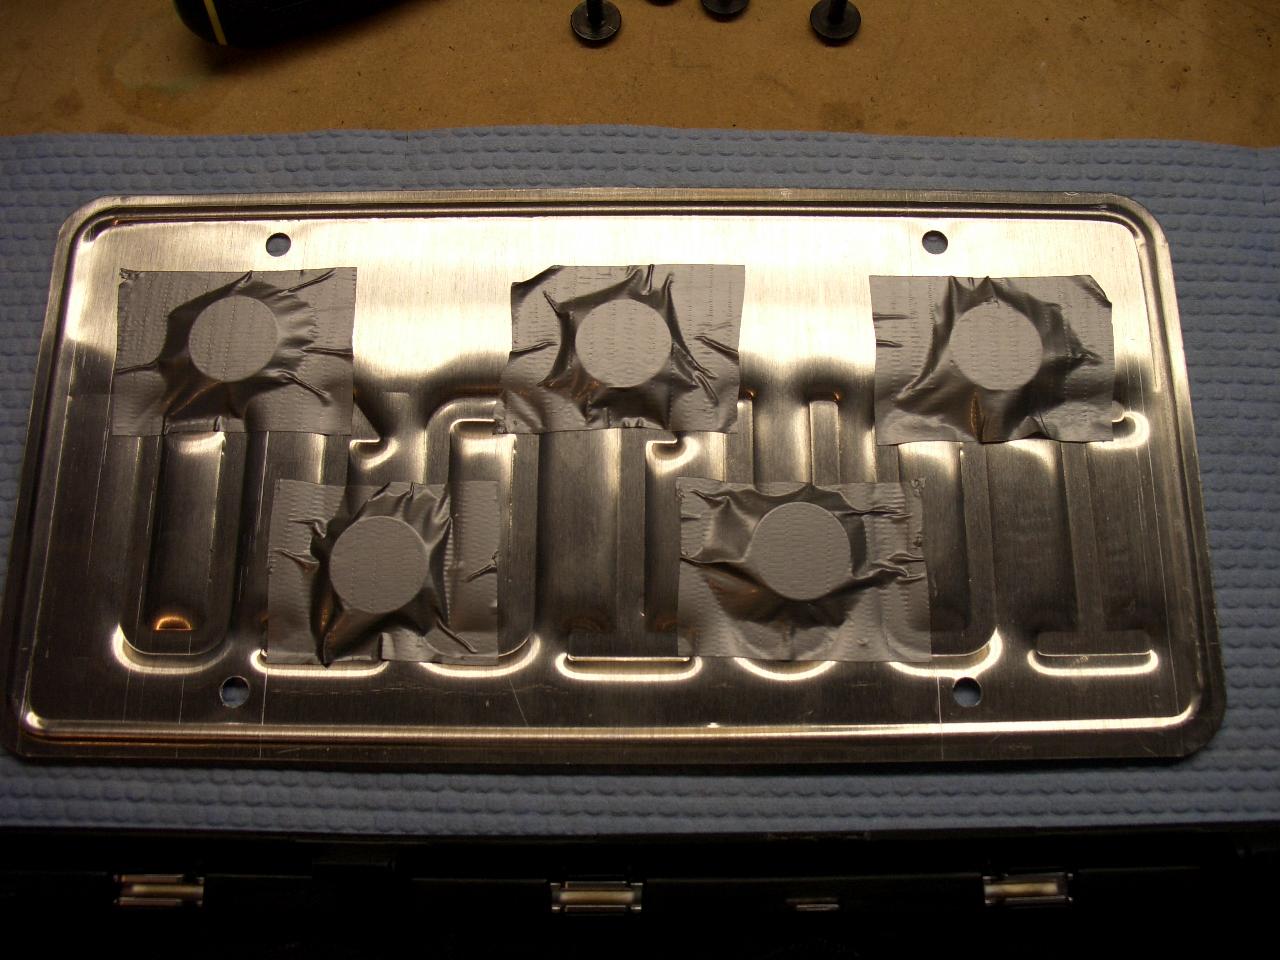 & DIY: B7 Mag Mount Licence Plate